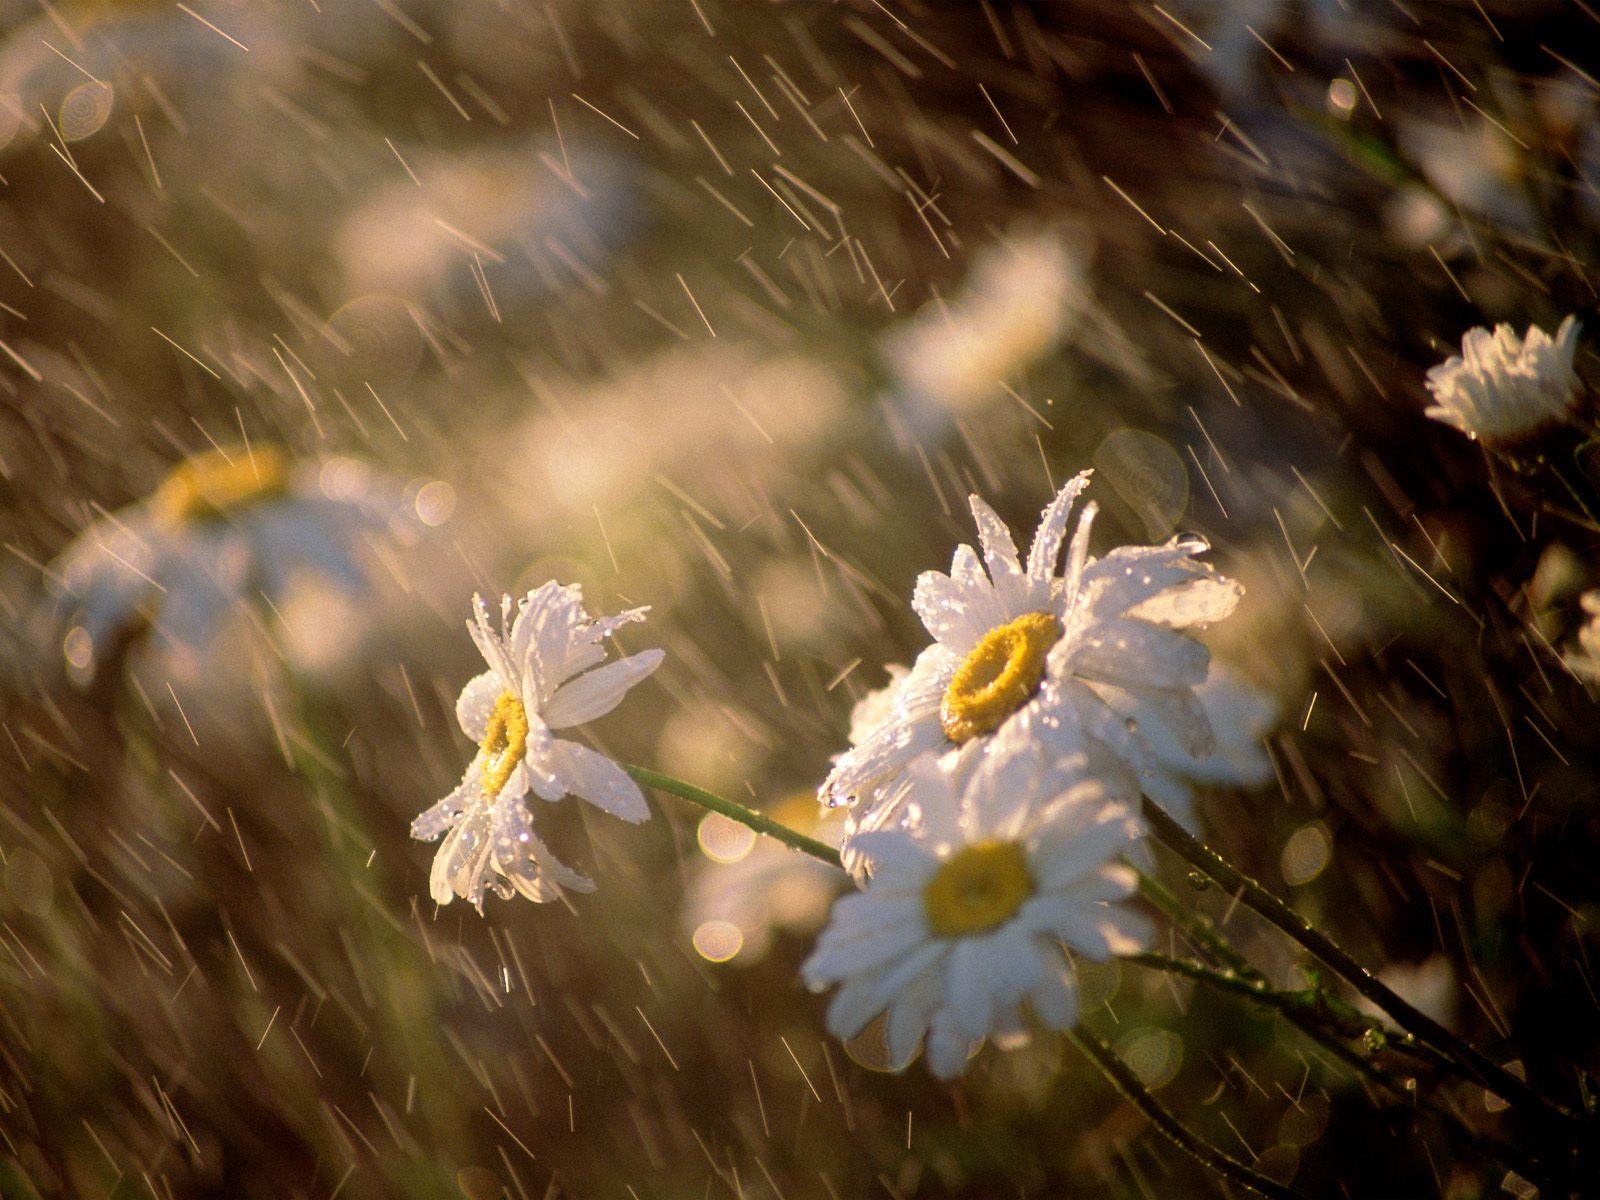 http://2.bp.blogspot.com/-PBKKItqJj1A/TVqi3bQ4pFI/AAAAAAAAA9A/rZ6KIoTsGN4/s1600/Wet_Daisies.jpg